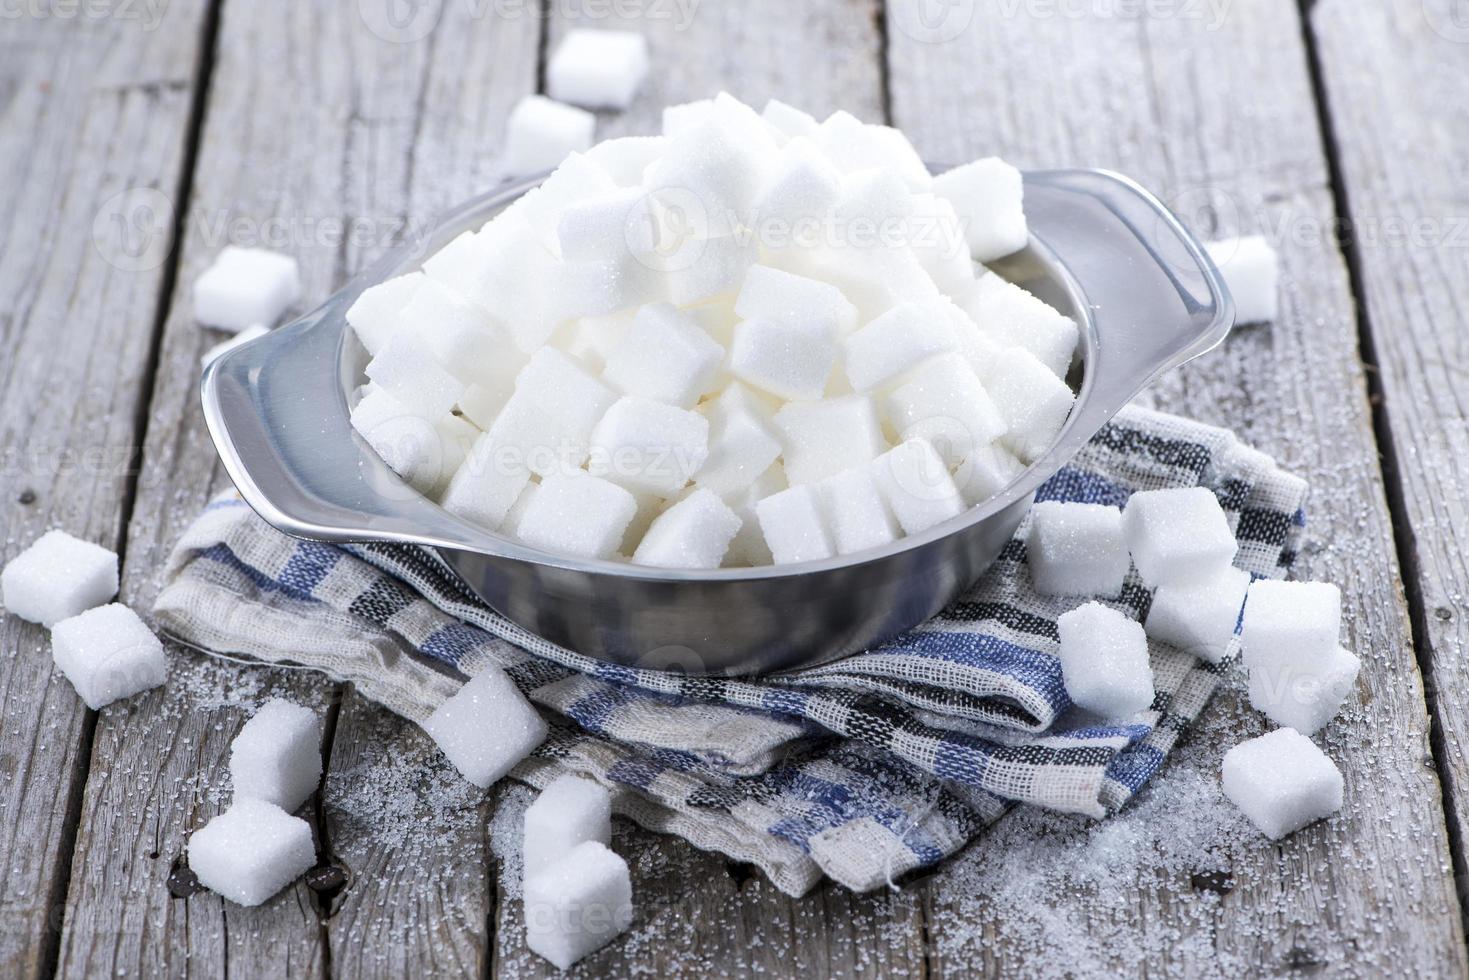 zucchero bianco foto